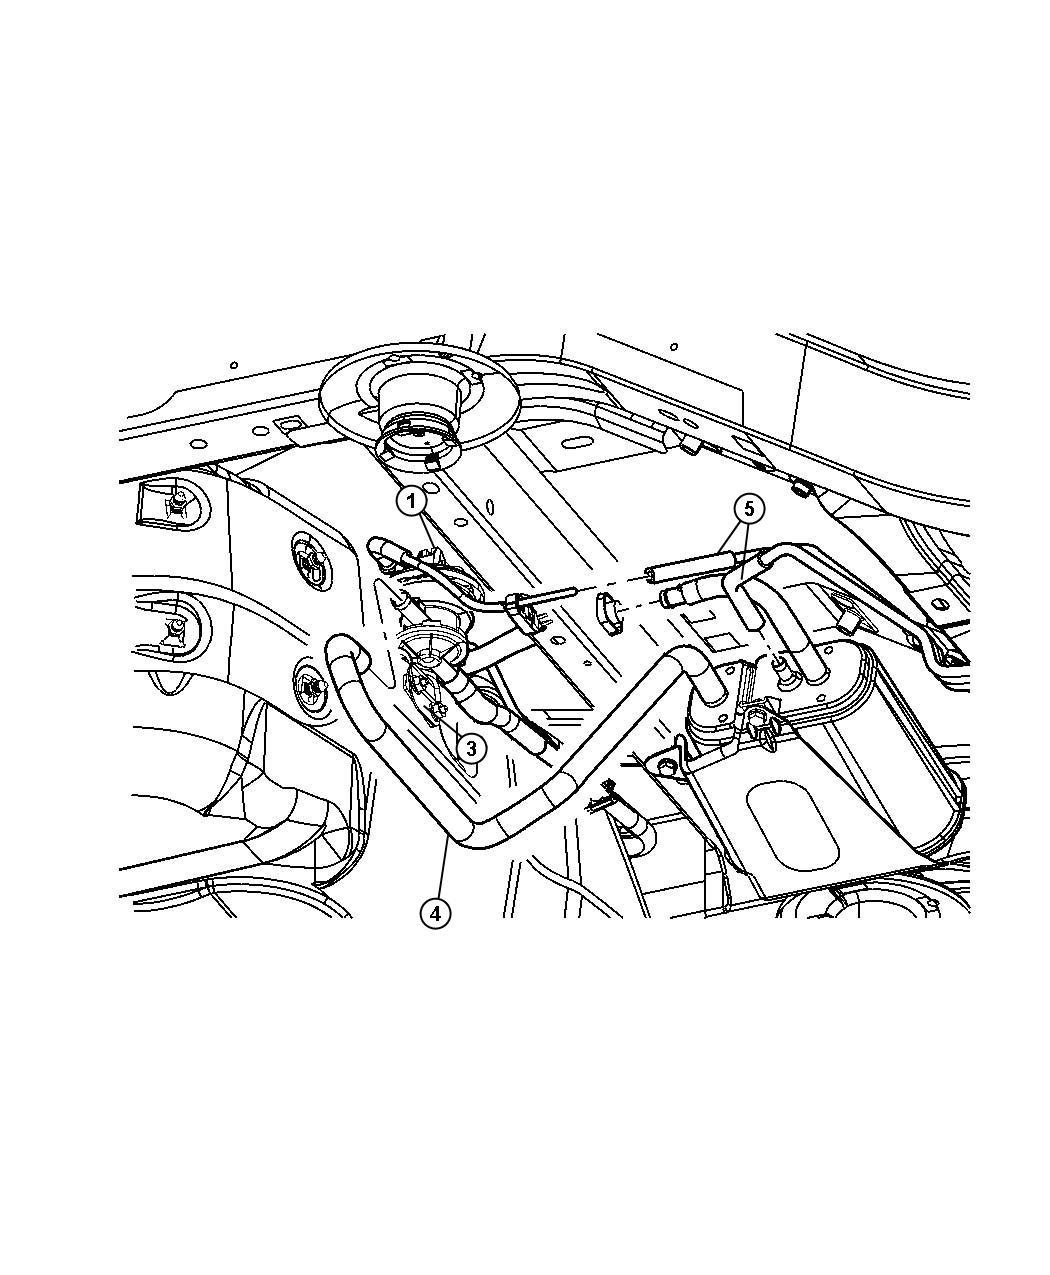 Jeep Liberty Leak Detection Pump 3 7l Ek0